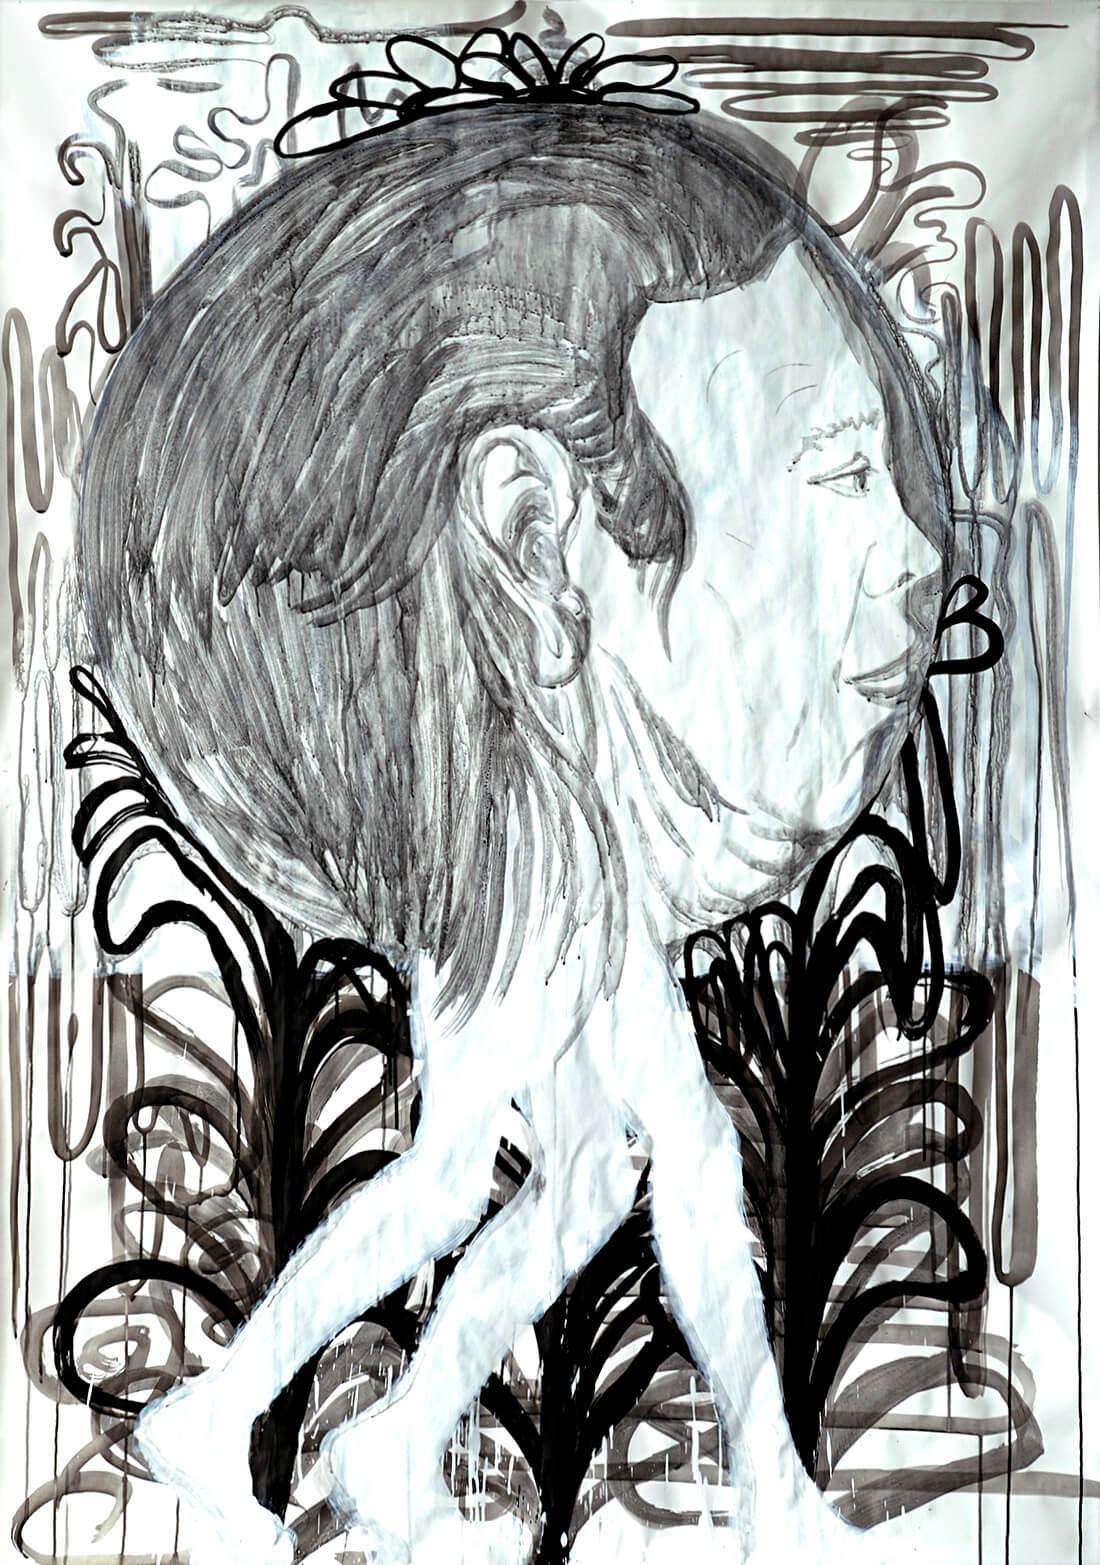 untitled (3-legged head), 210 x 130 cm, mixed media on paper, 2007